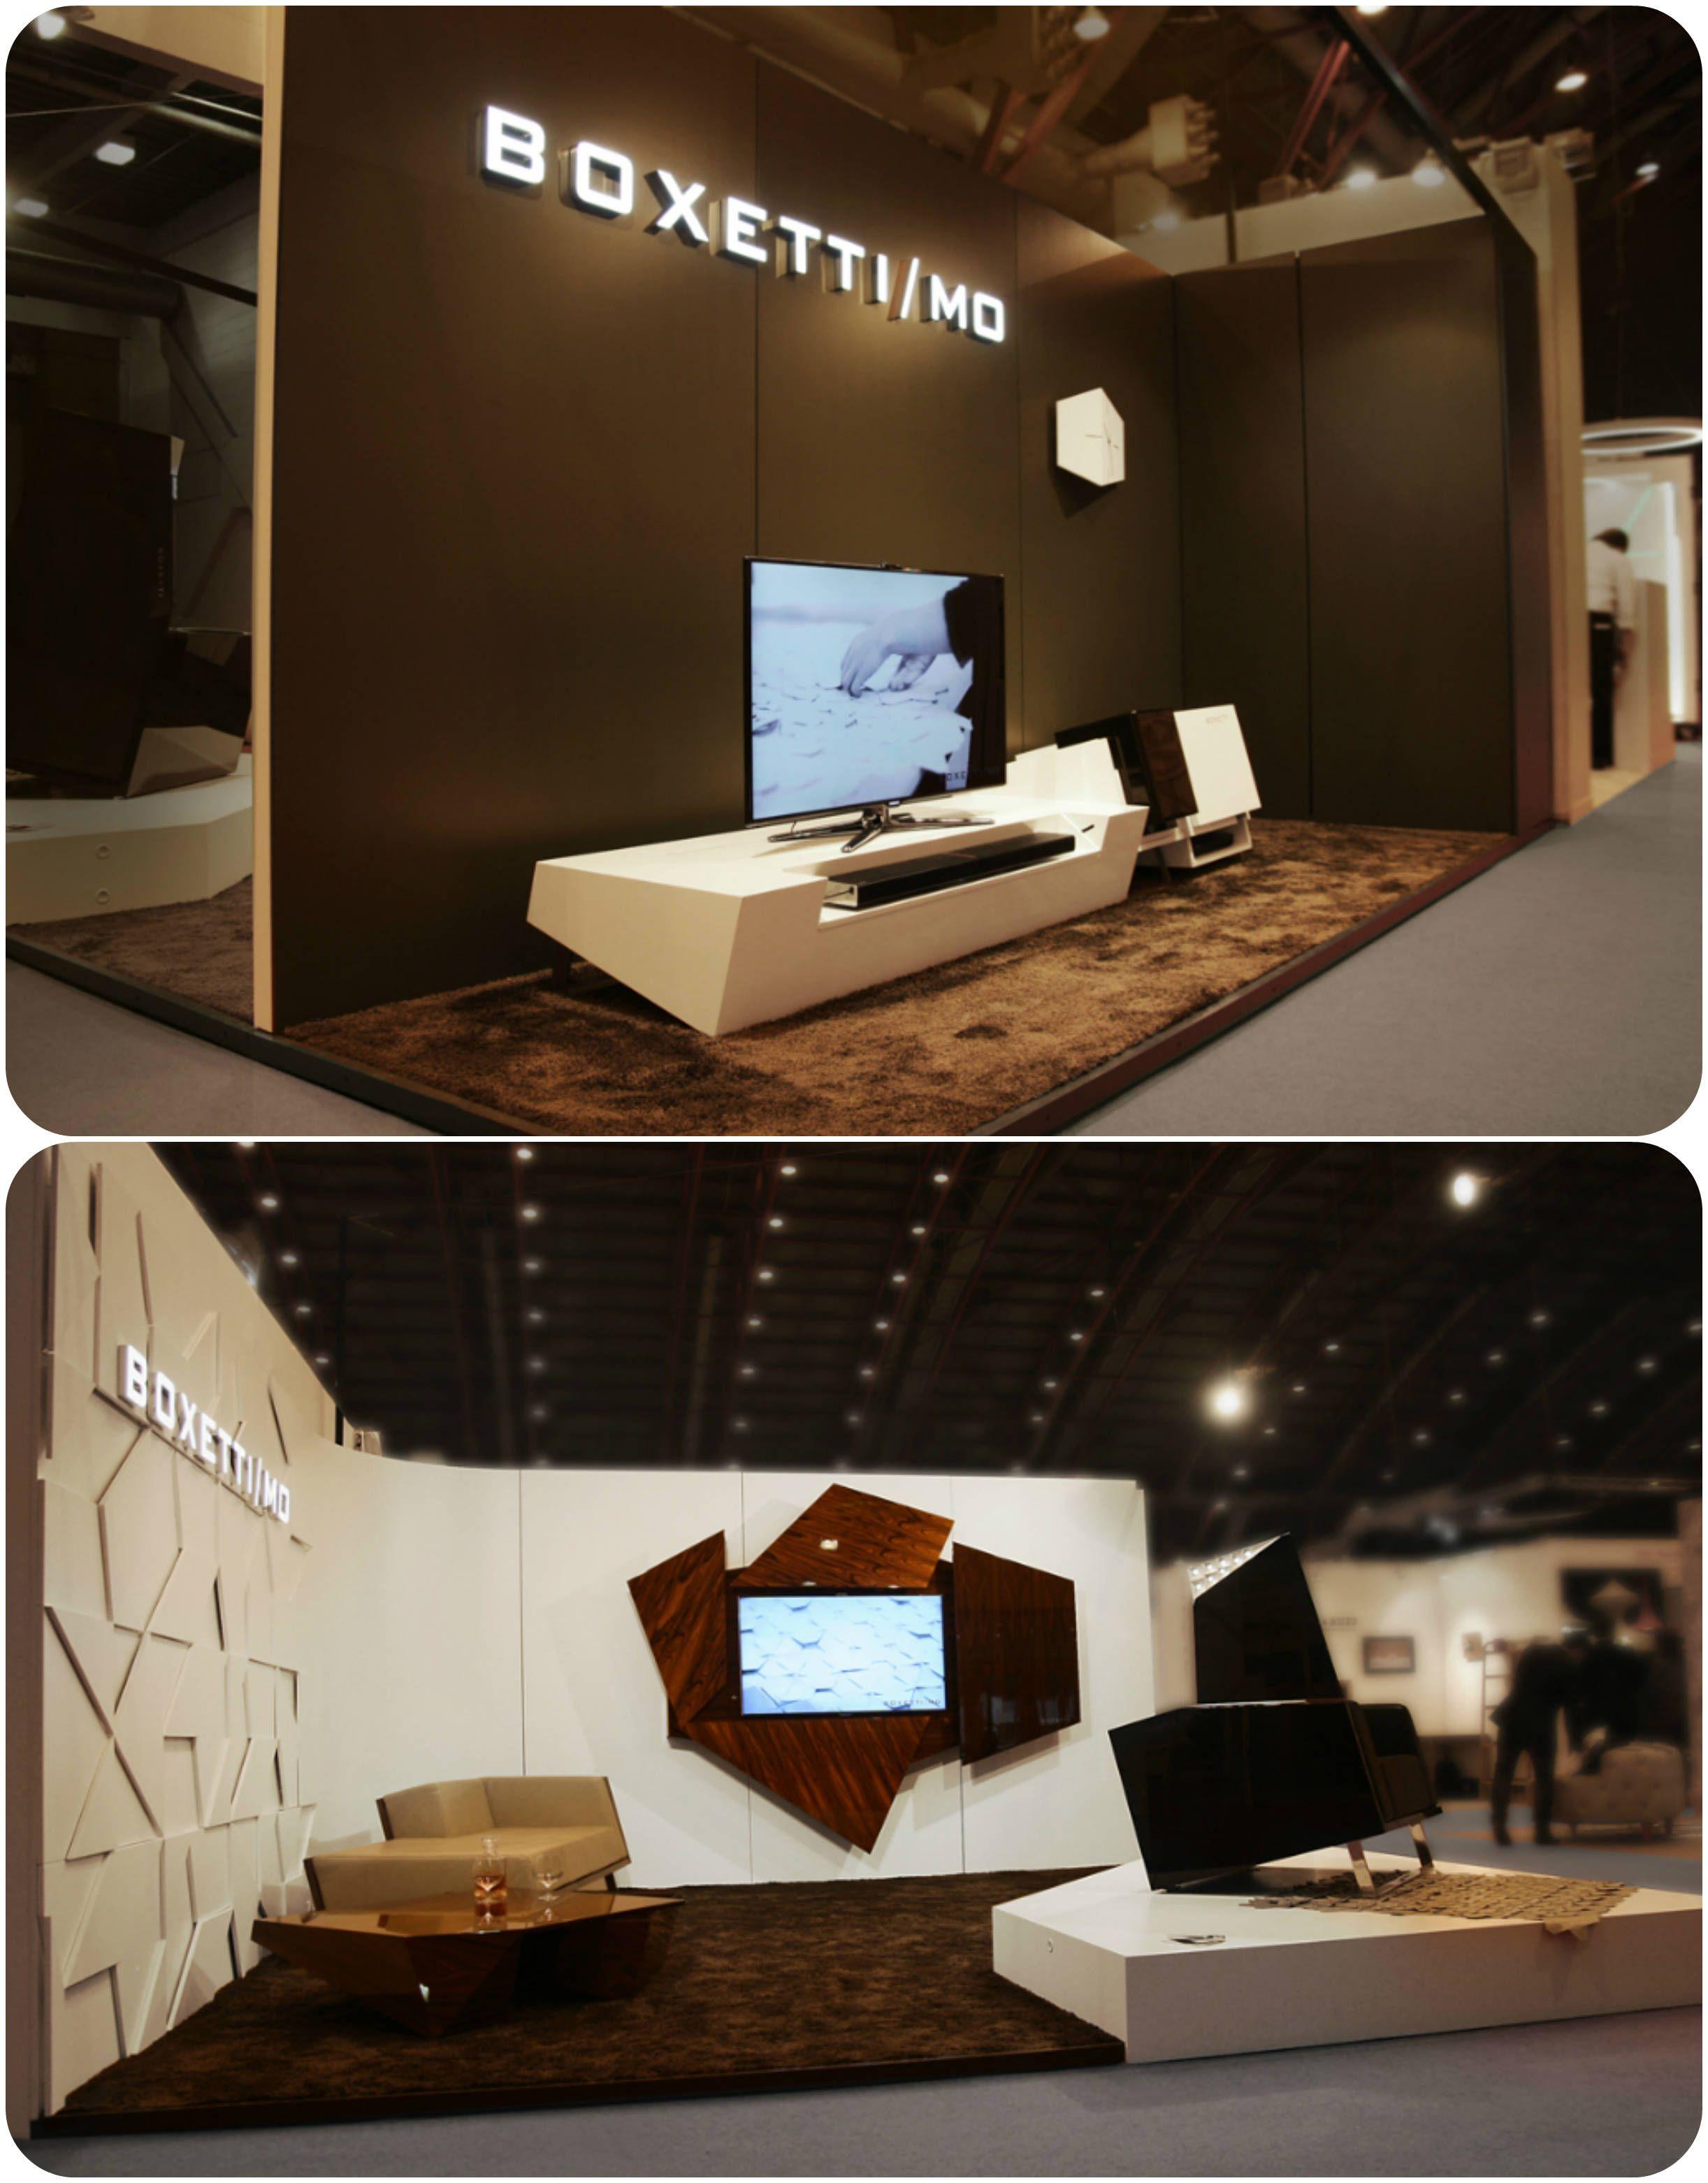 Furniture Design Exhibition London 100% design london 2014 exhibition. #boxetti #furniture #art